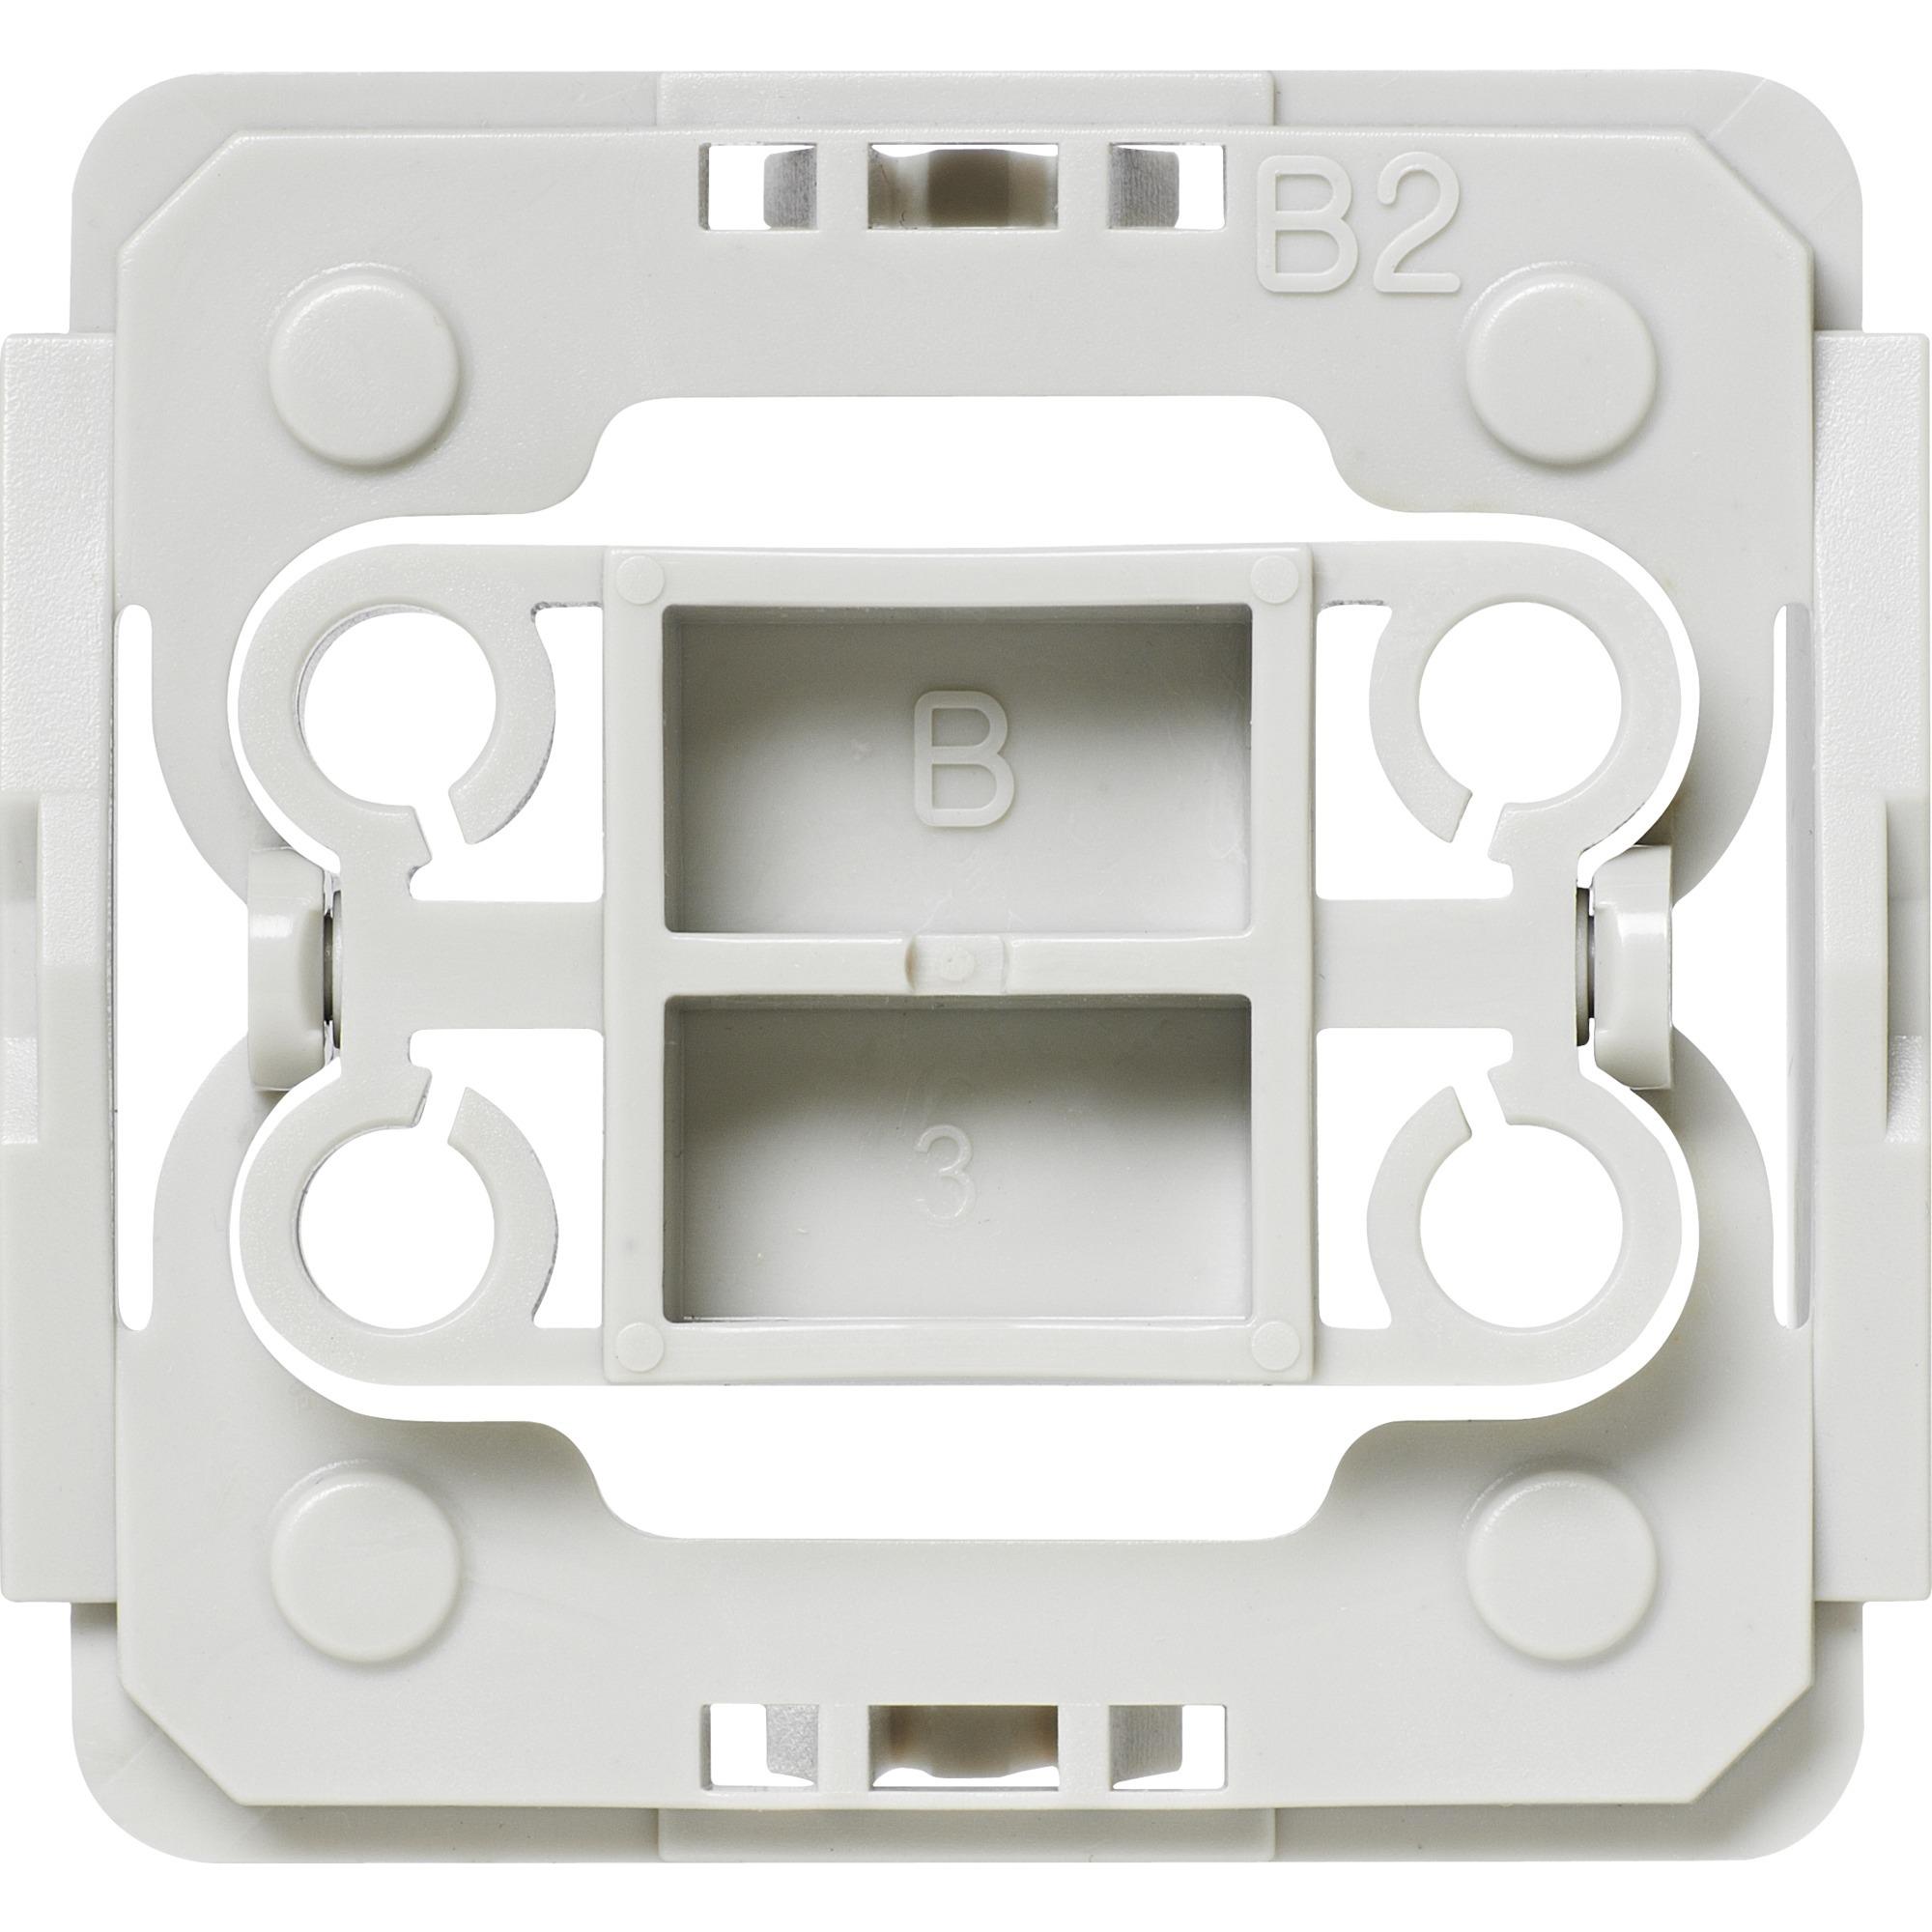 EQ3-ADA-B2 Integrado Atenuador e interruptor Gris, Color blanco, Adaptador